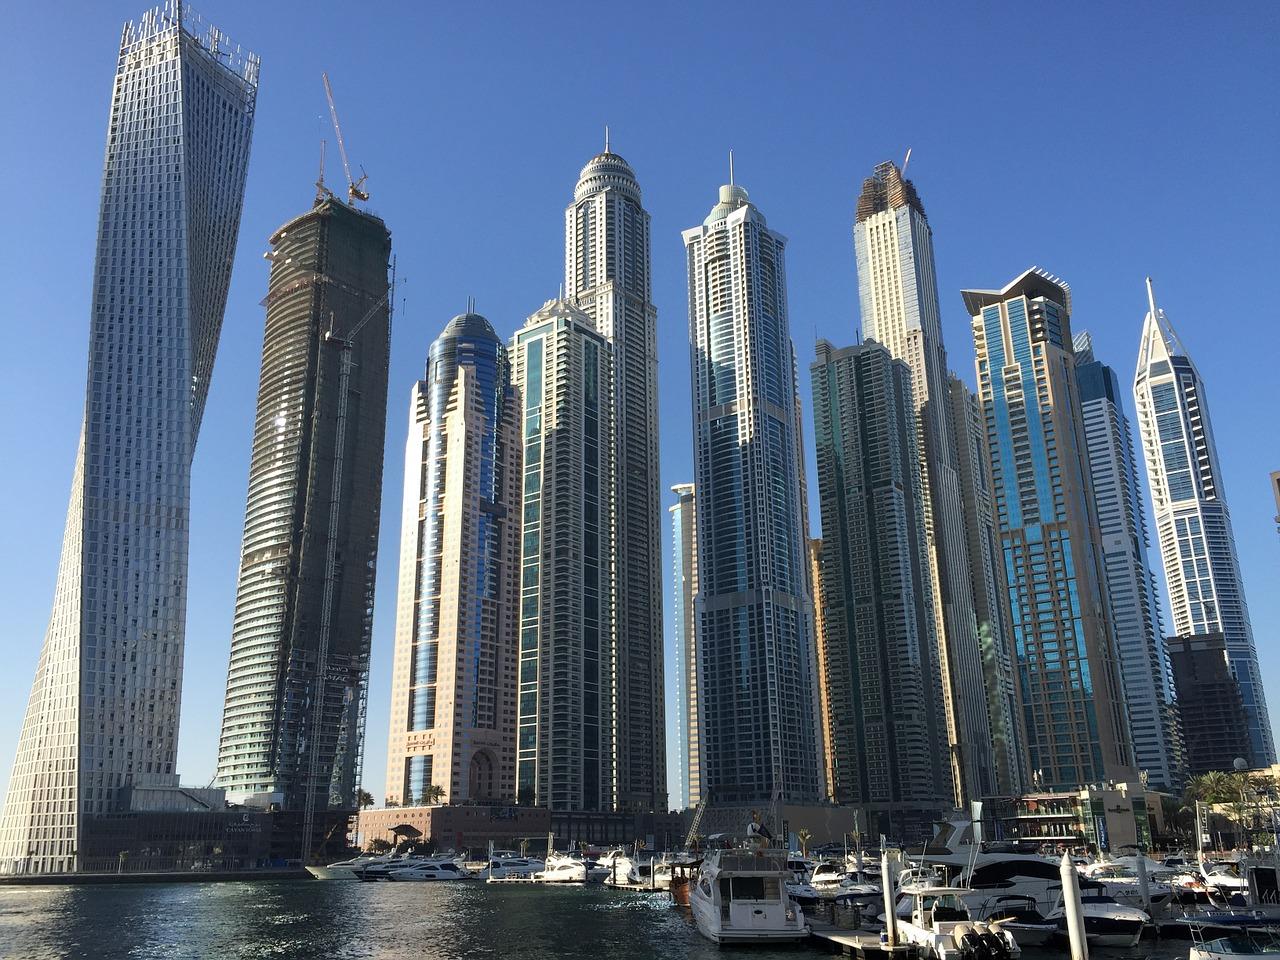 Skyscrapers in Dubai. So many activities in Dubai